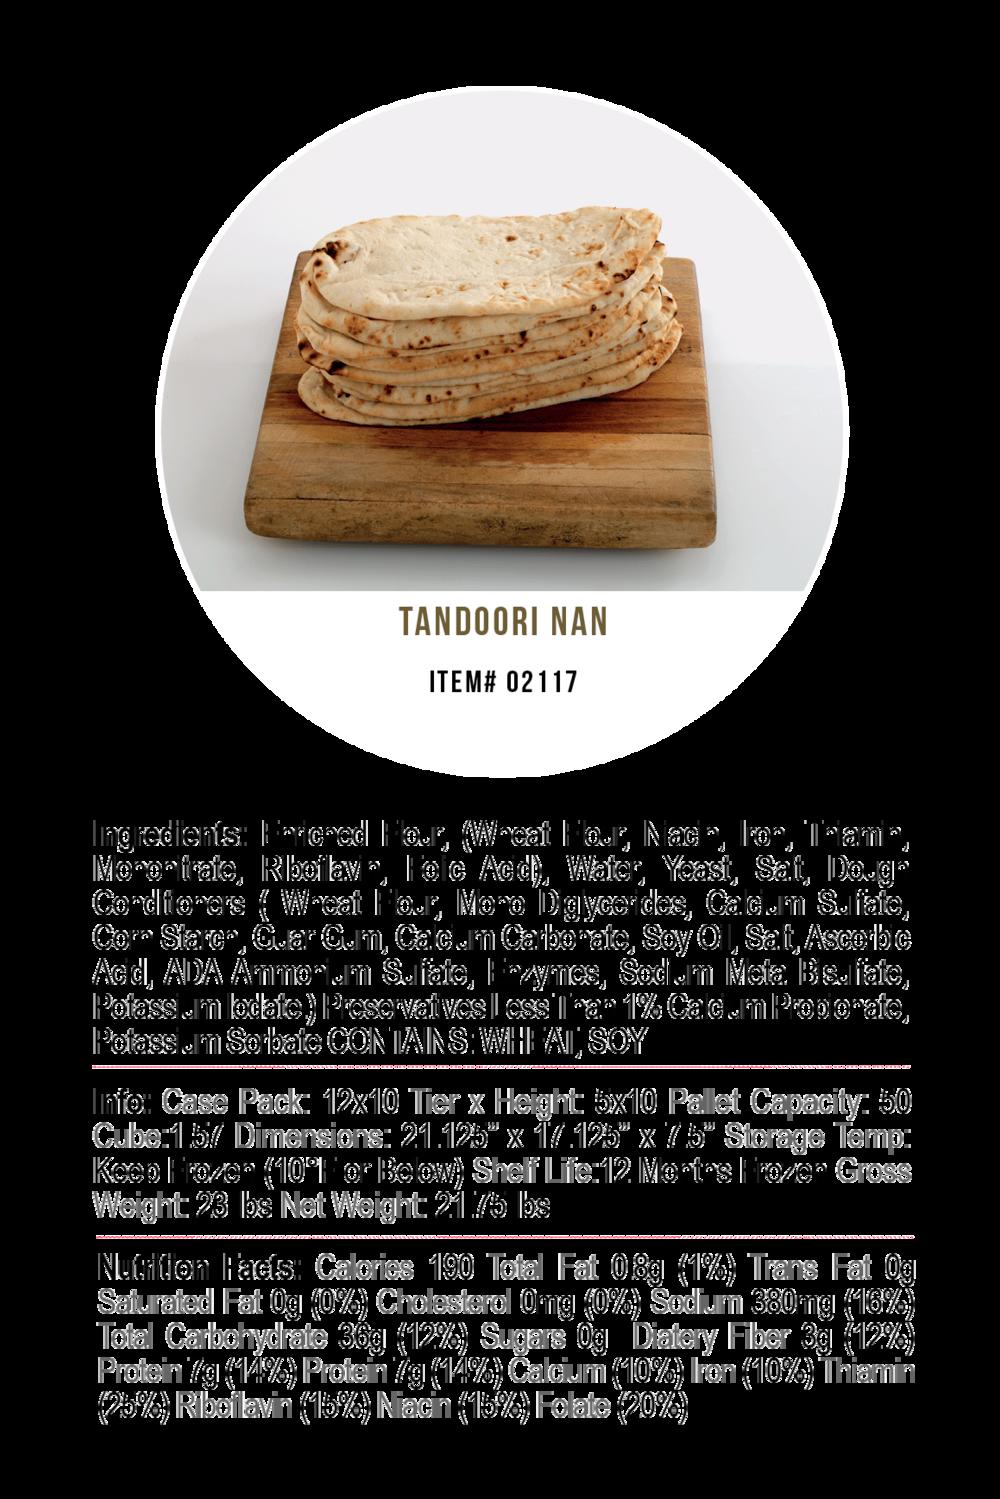 corfu-specialty-flat-breads-tandoori nan.png